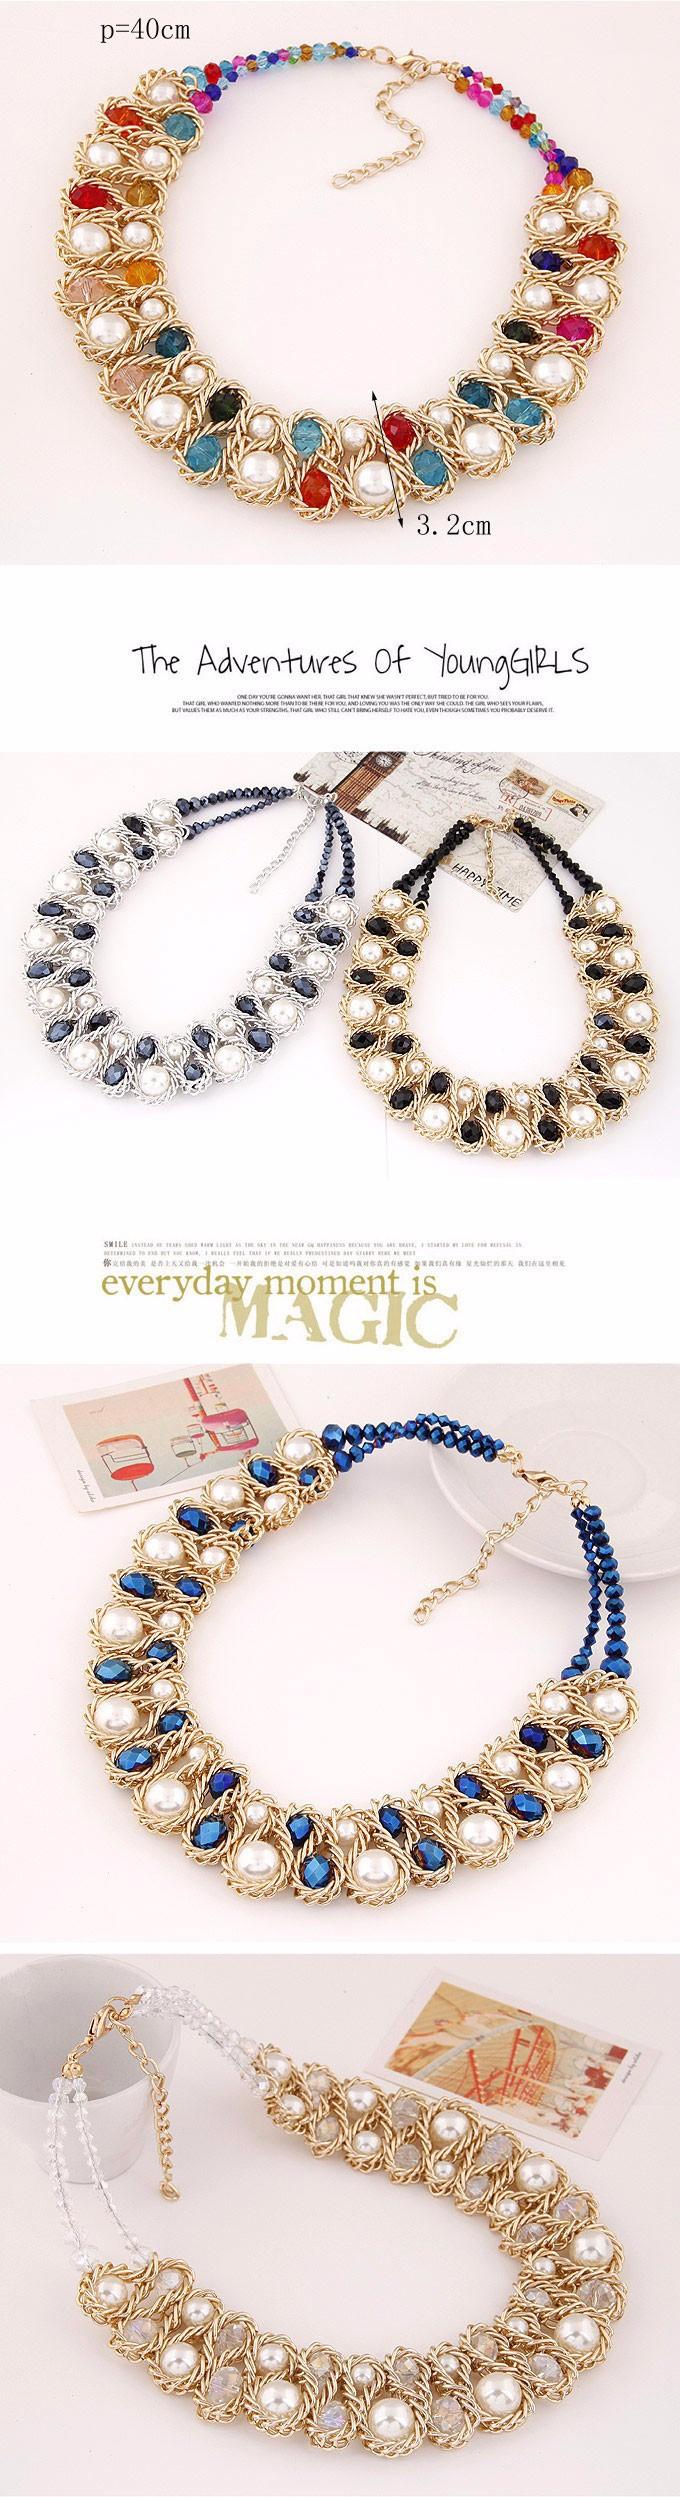 HTB1hhwjIpXXXXc9XpXXq6xXFXXX2 - Statement necklace Fashion for Women 2017 Chunky Bead Gold Chain Double Crystal Big Pearl Choker Necklaces & Pendants Jewelry